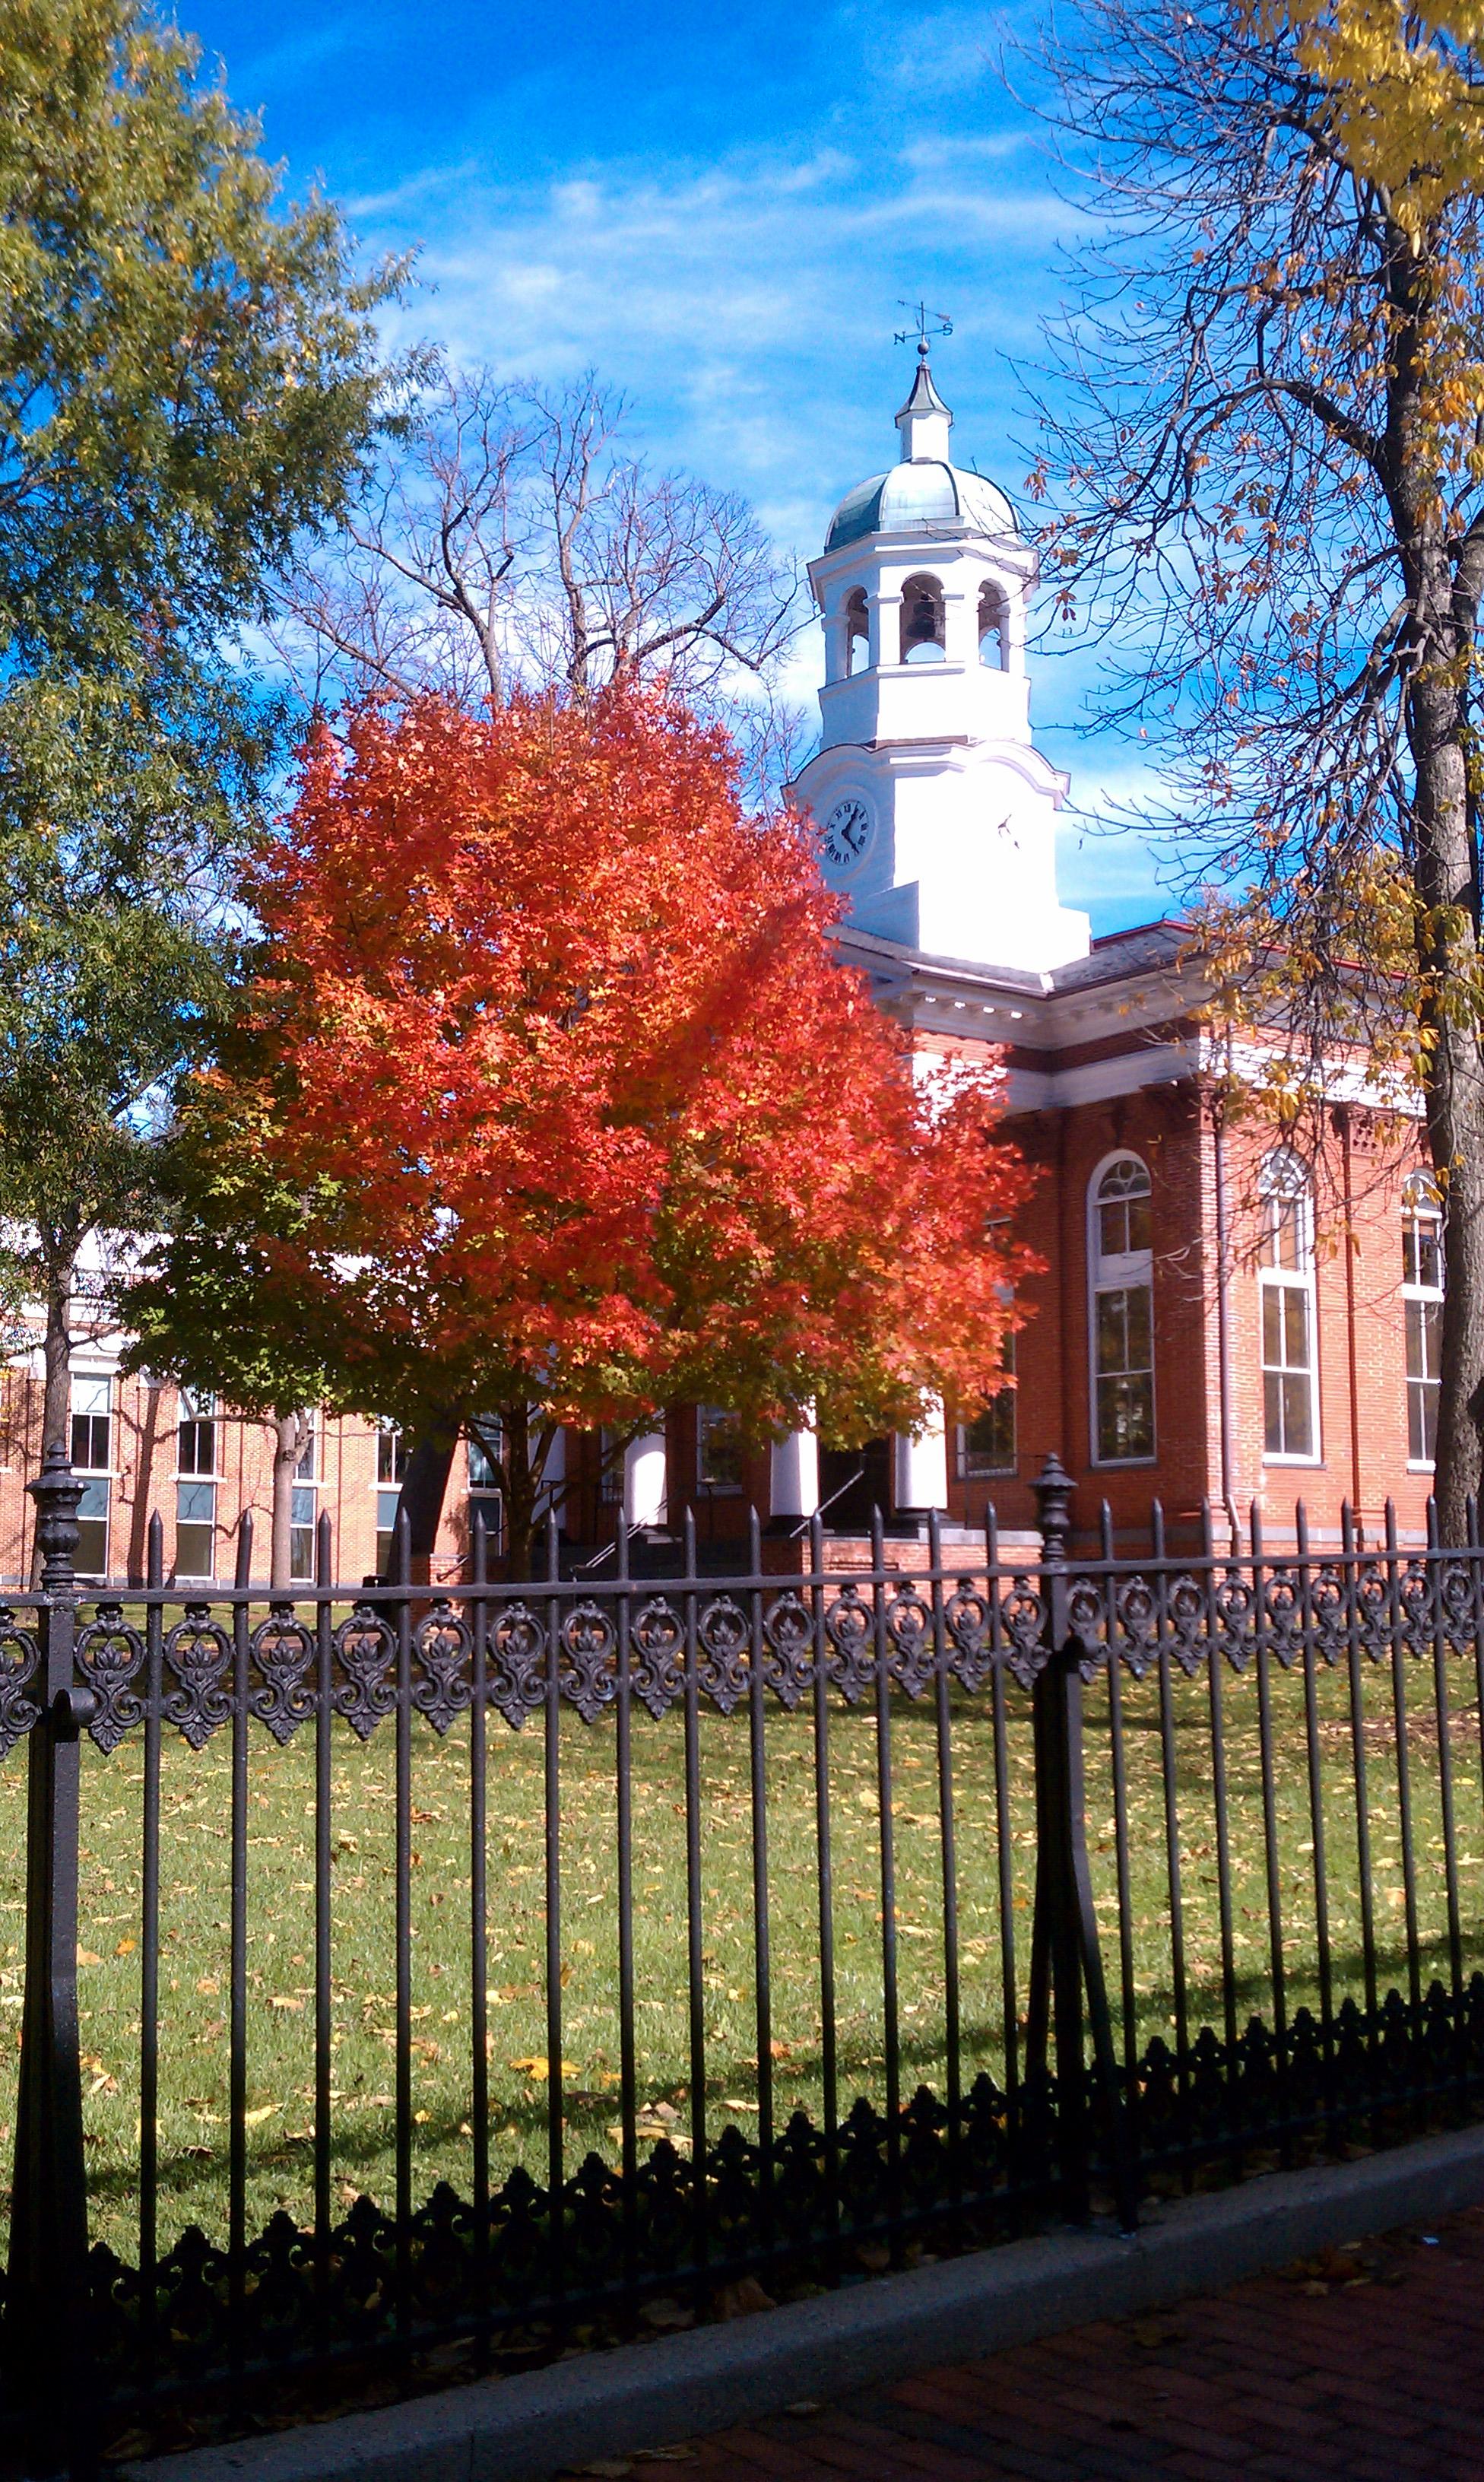 Leesburg Loudoun County courthouse in autumn